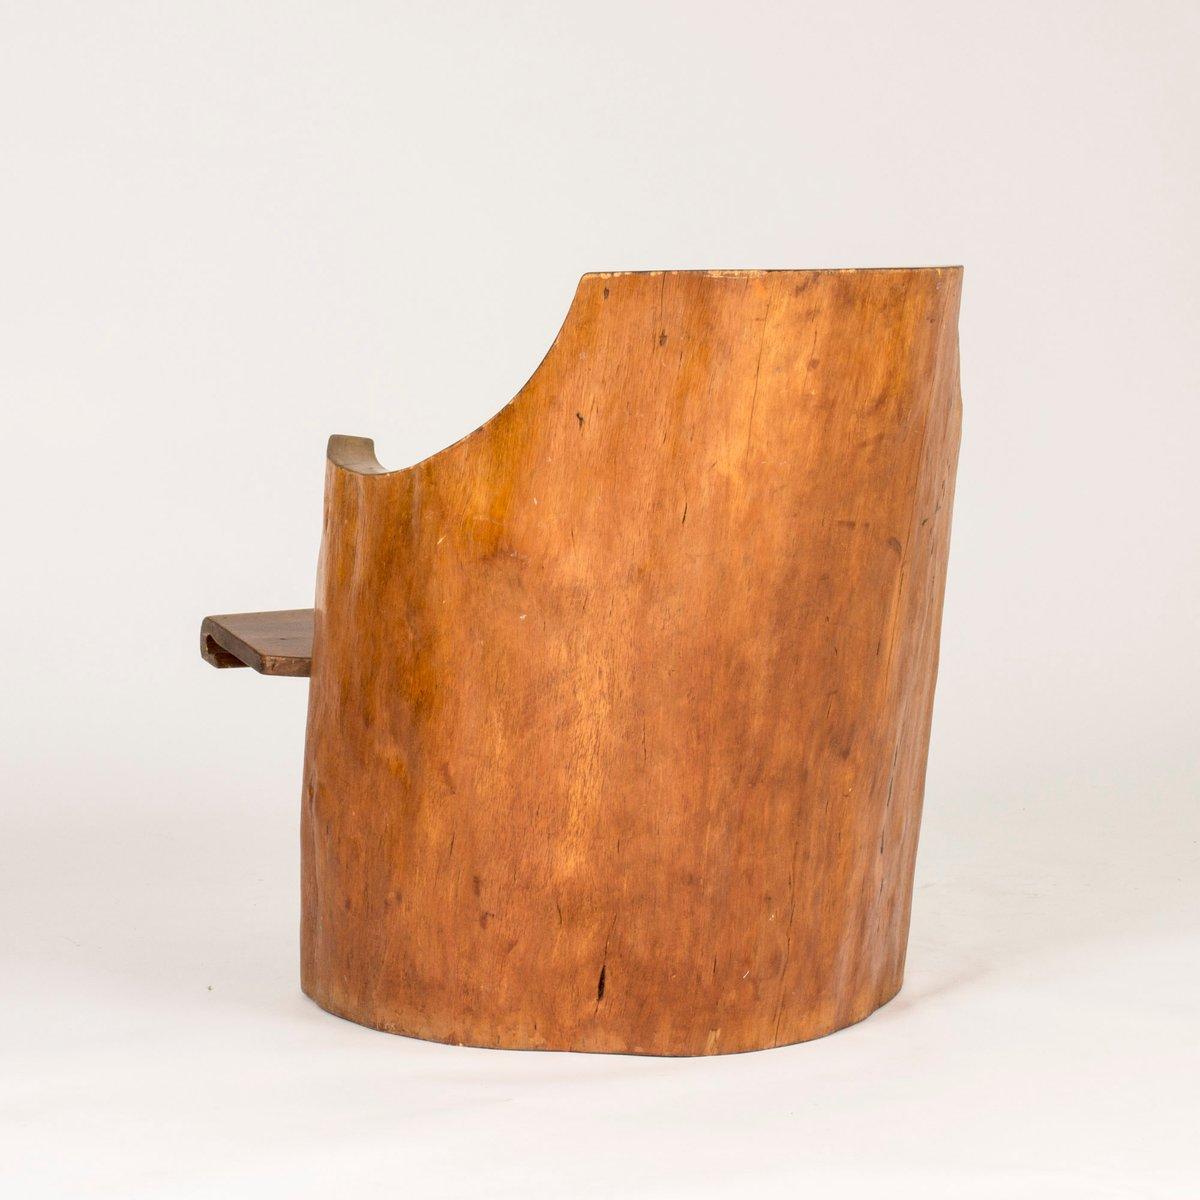 schwedischer kiefer baumstumpf armlehnstuhl 1934 bei. Black Bedroom Furniture Sets. Home Design Ideas